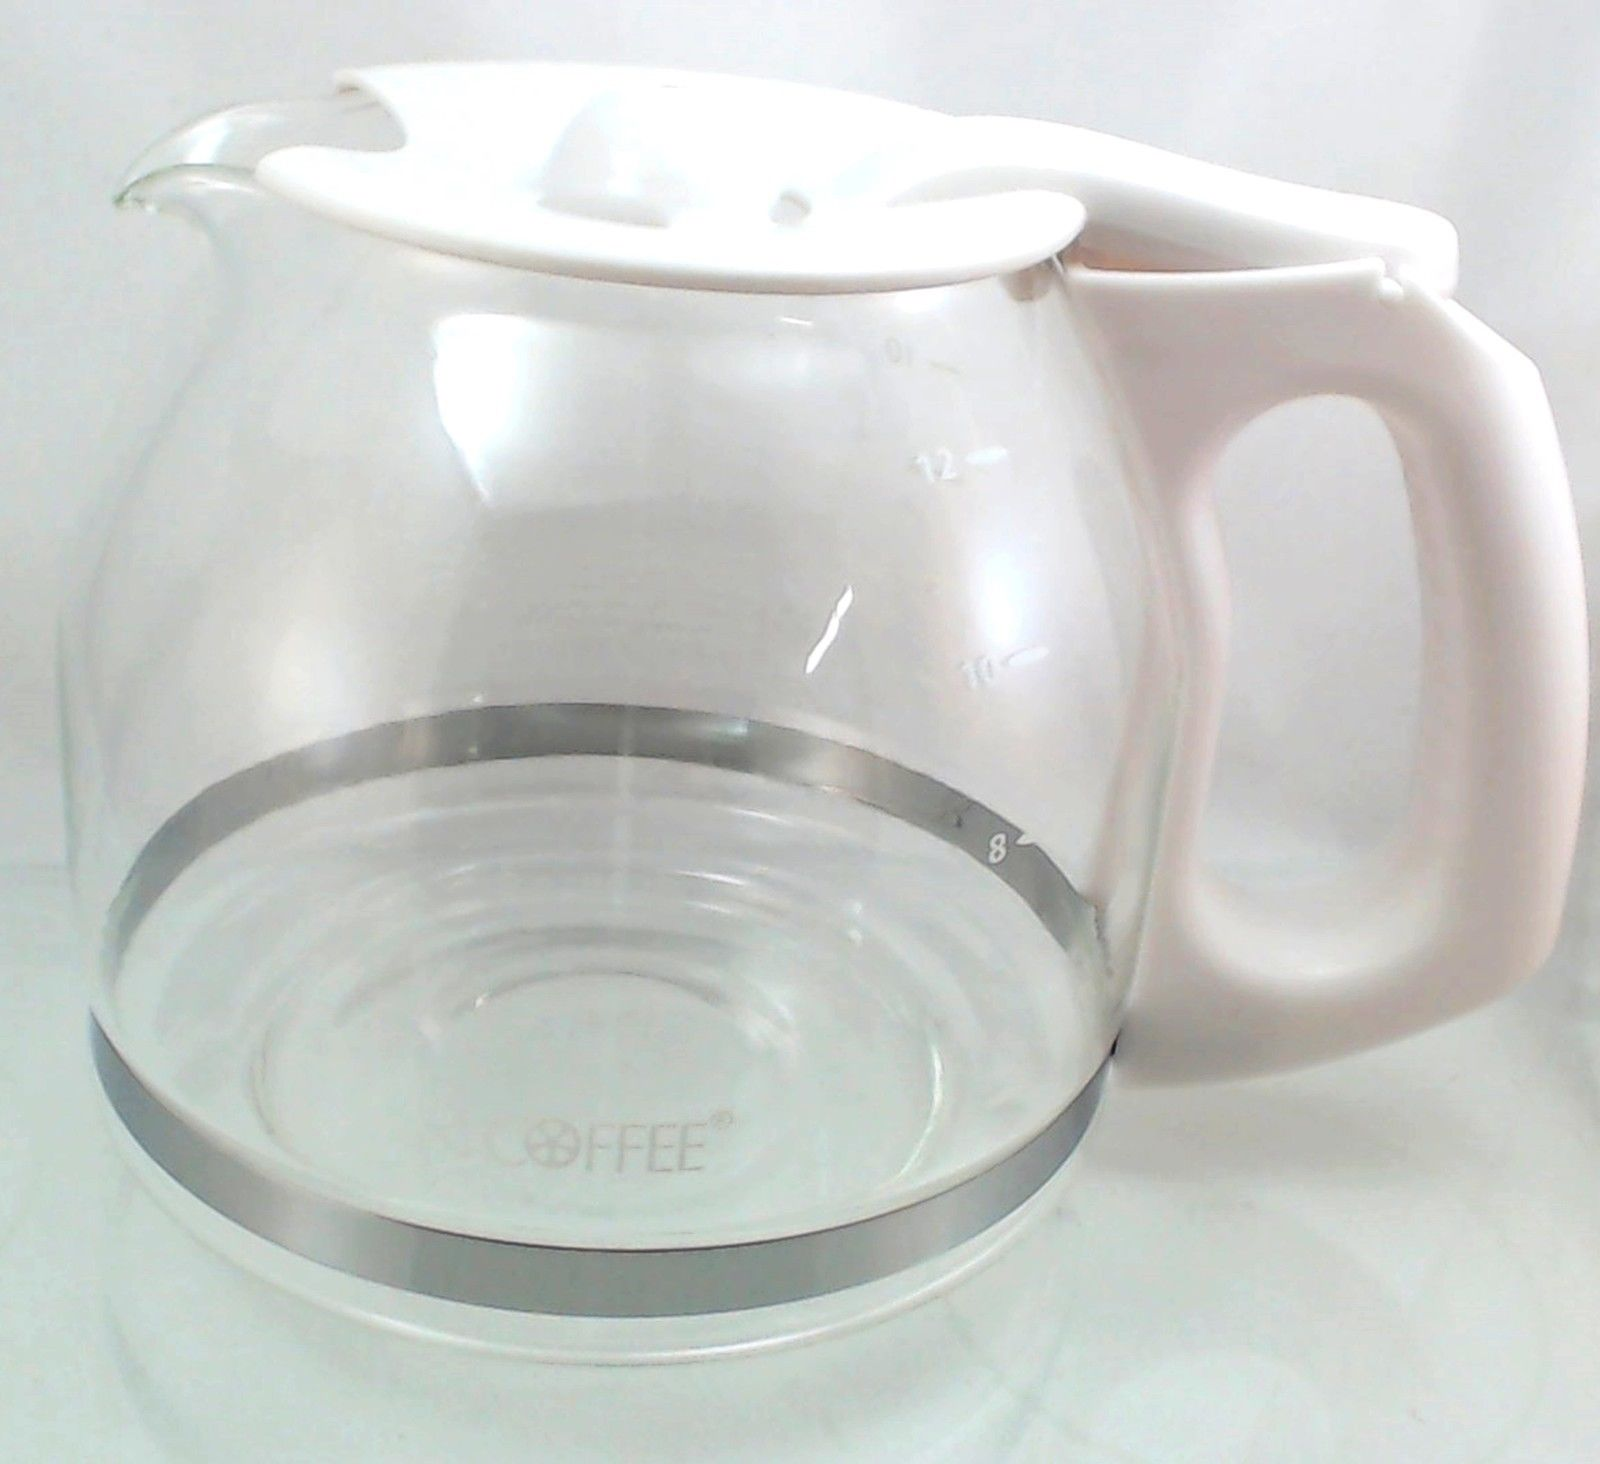 Mr Coffee Coffeemaker Glass Carafe White 12 Cup Pld13 Ebay